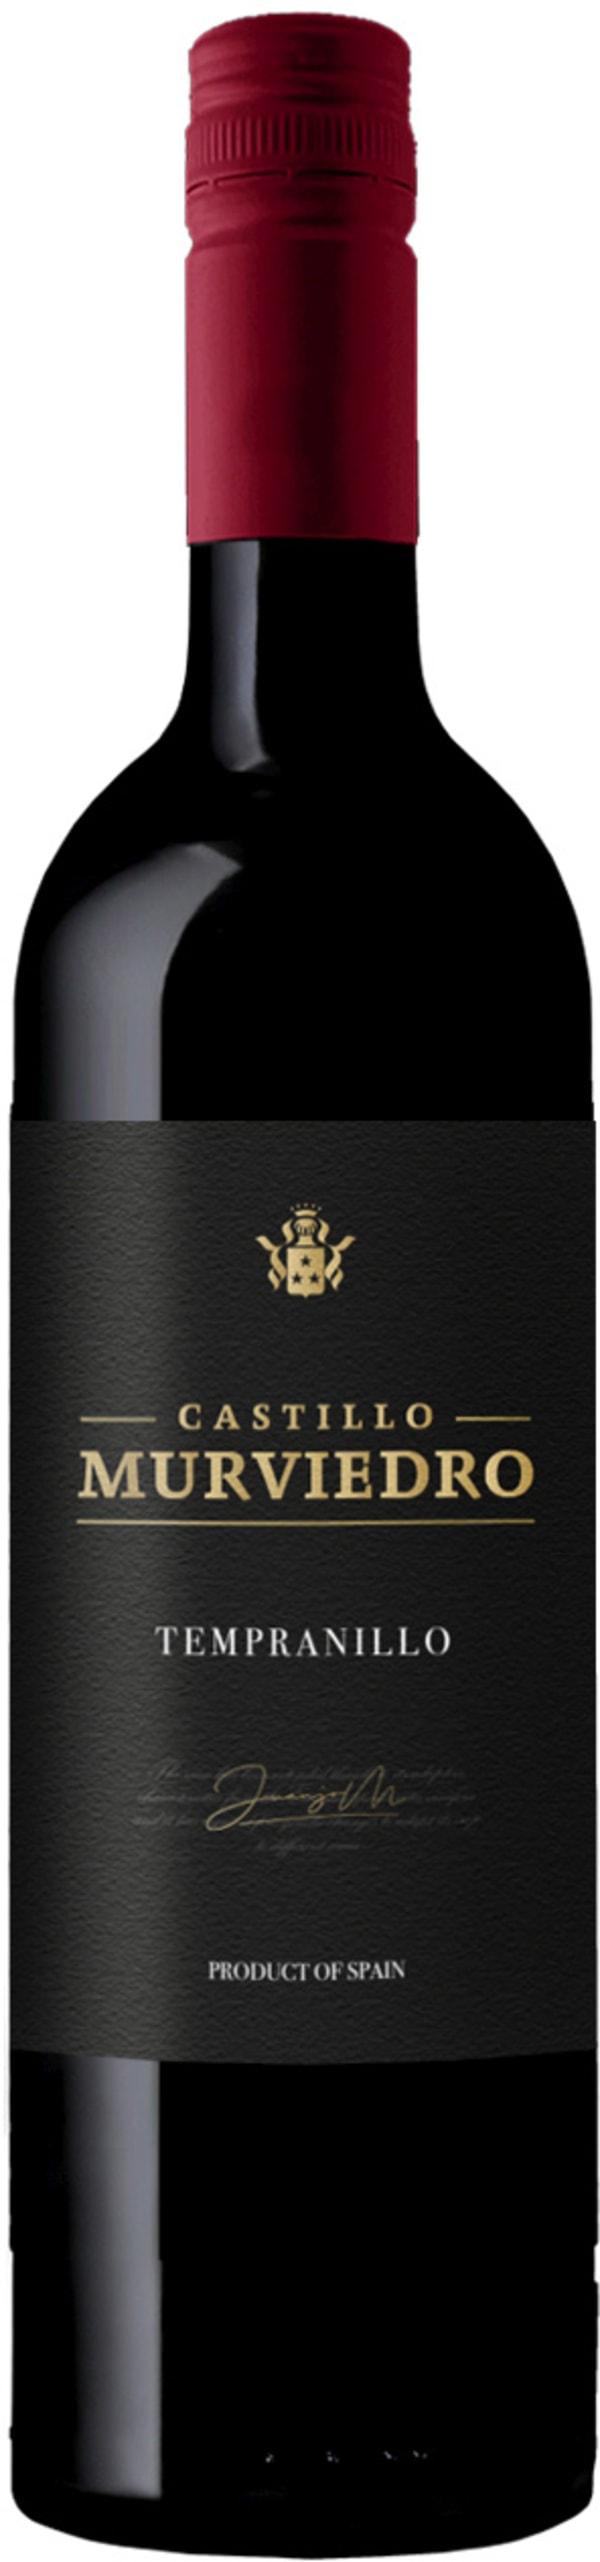 Castillo Murviedro Tempranillo 2015